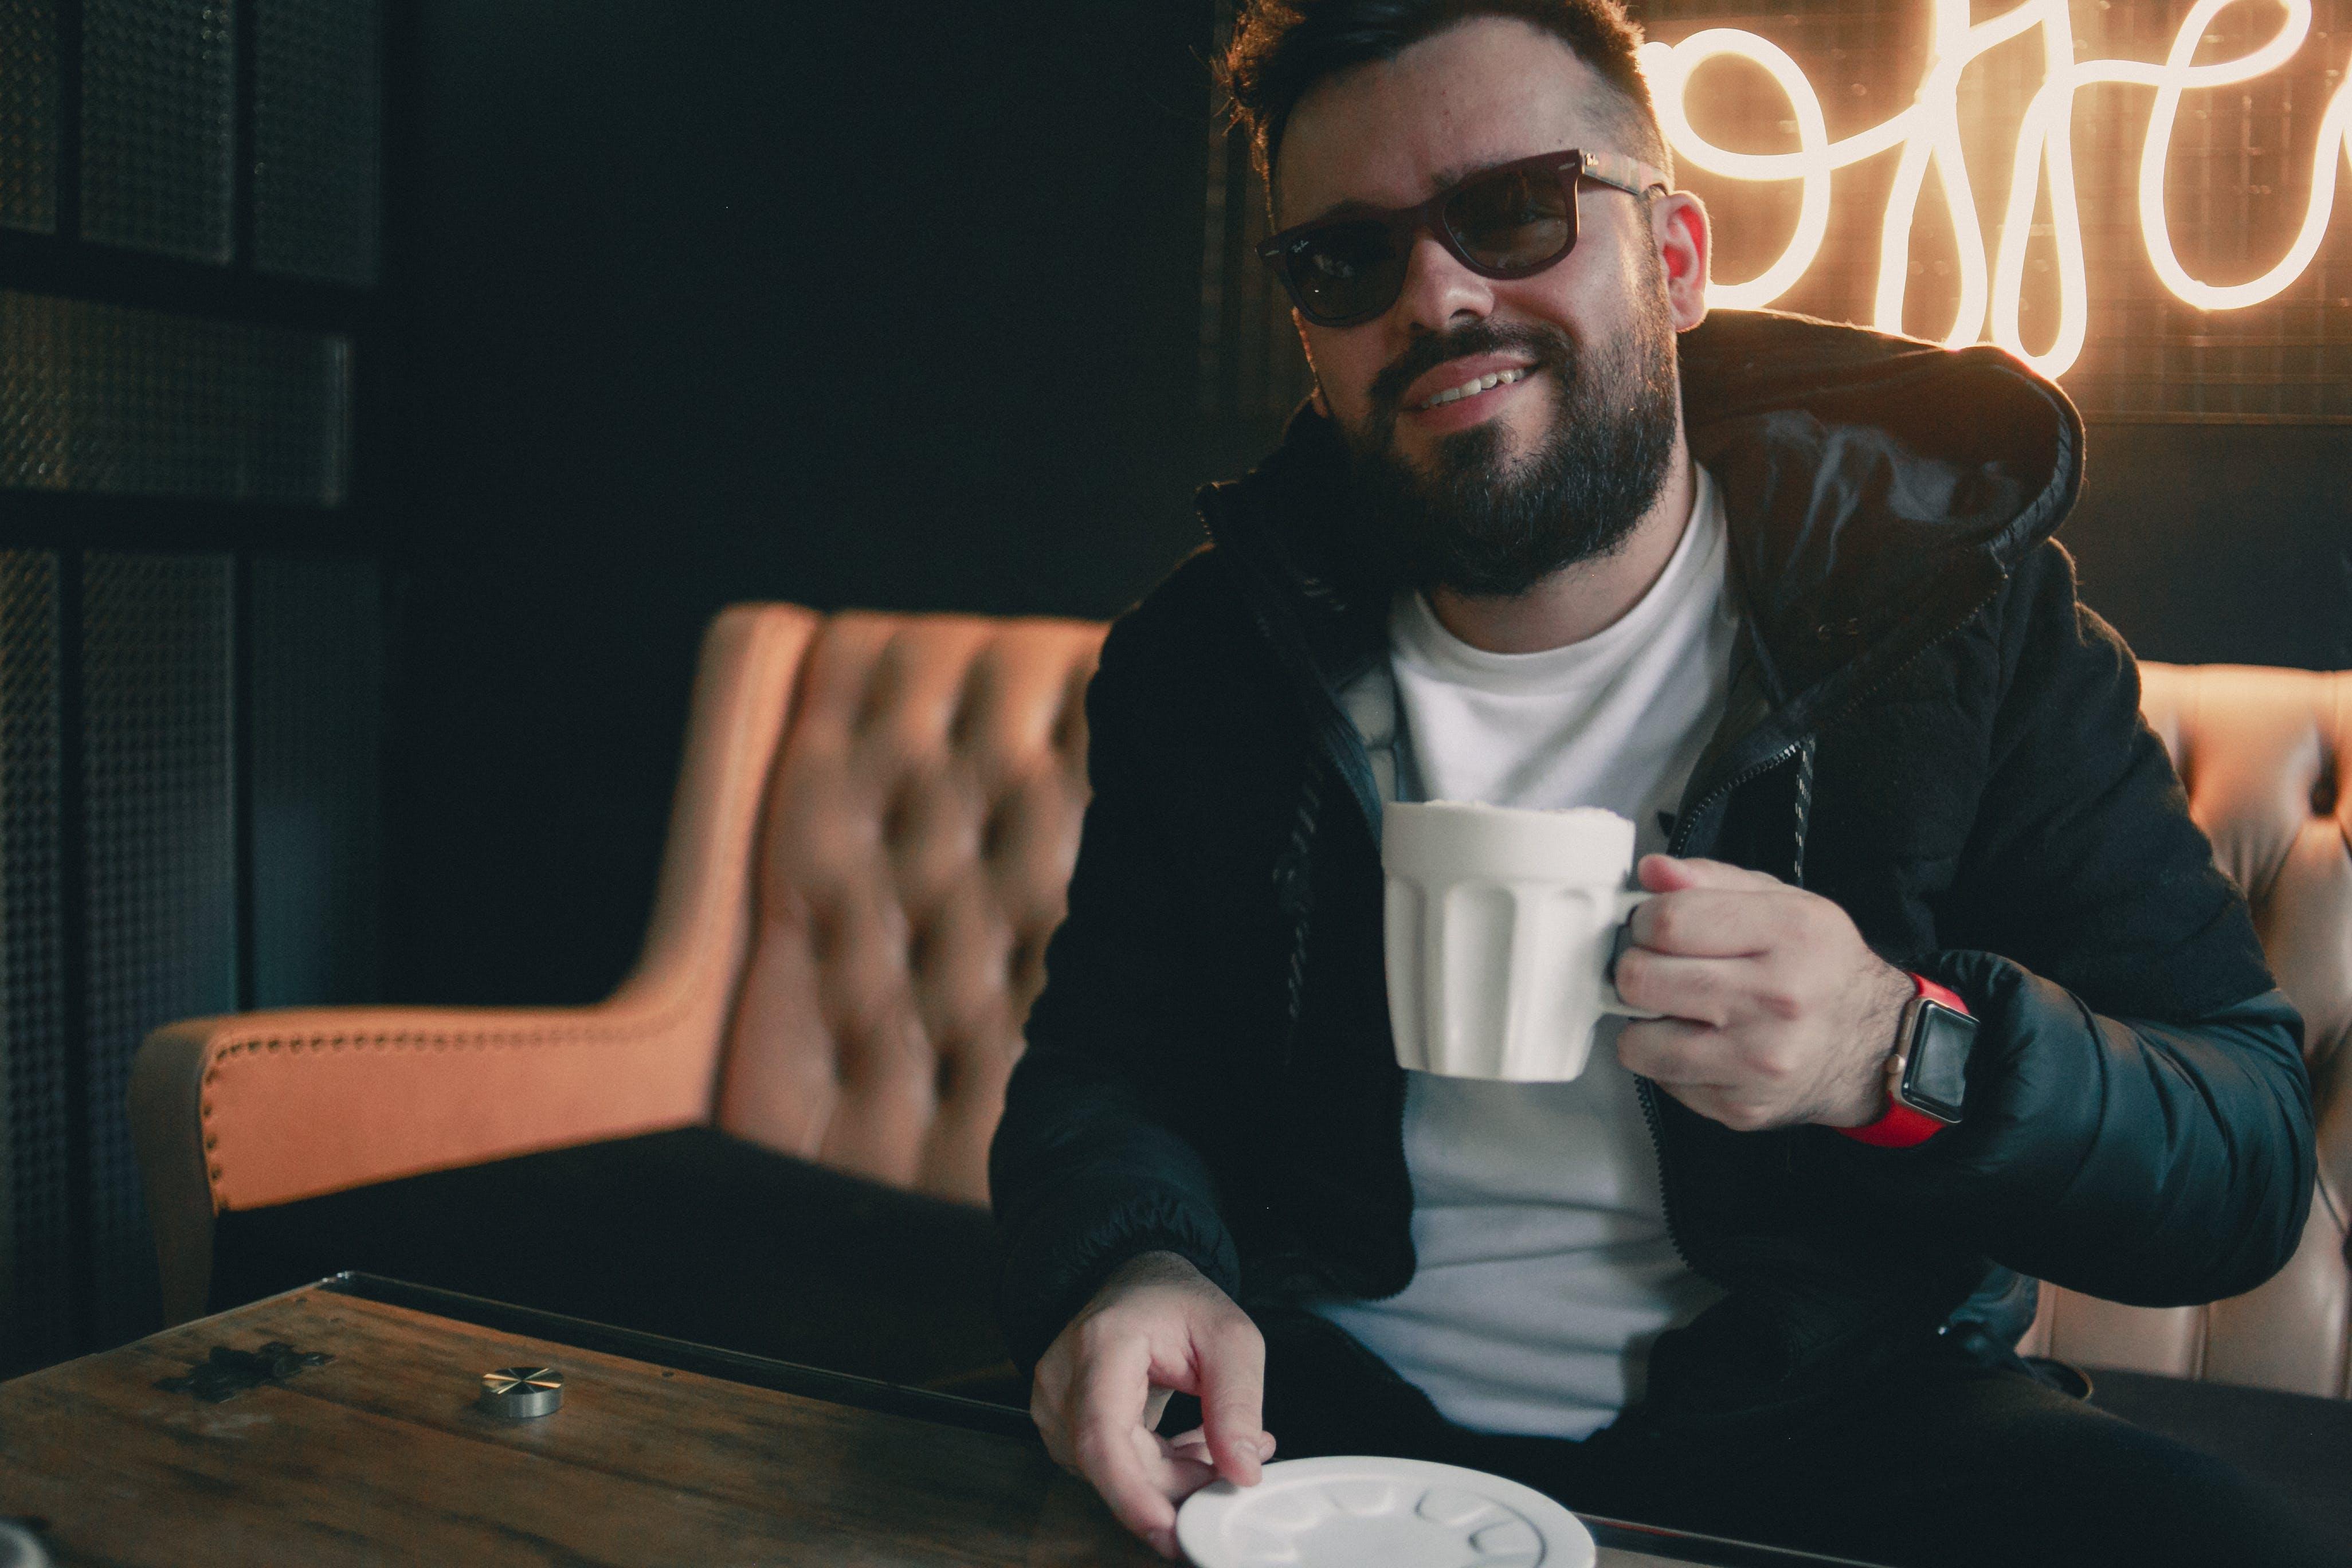 Fotos de stock gratuitas de adentro, café, cafetería, copa